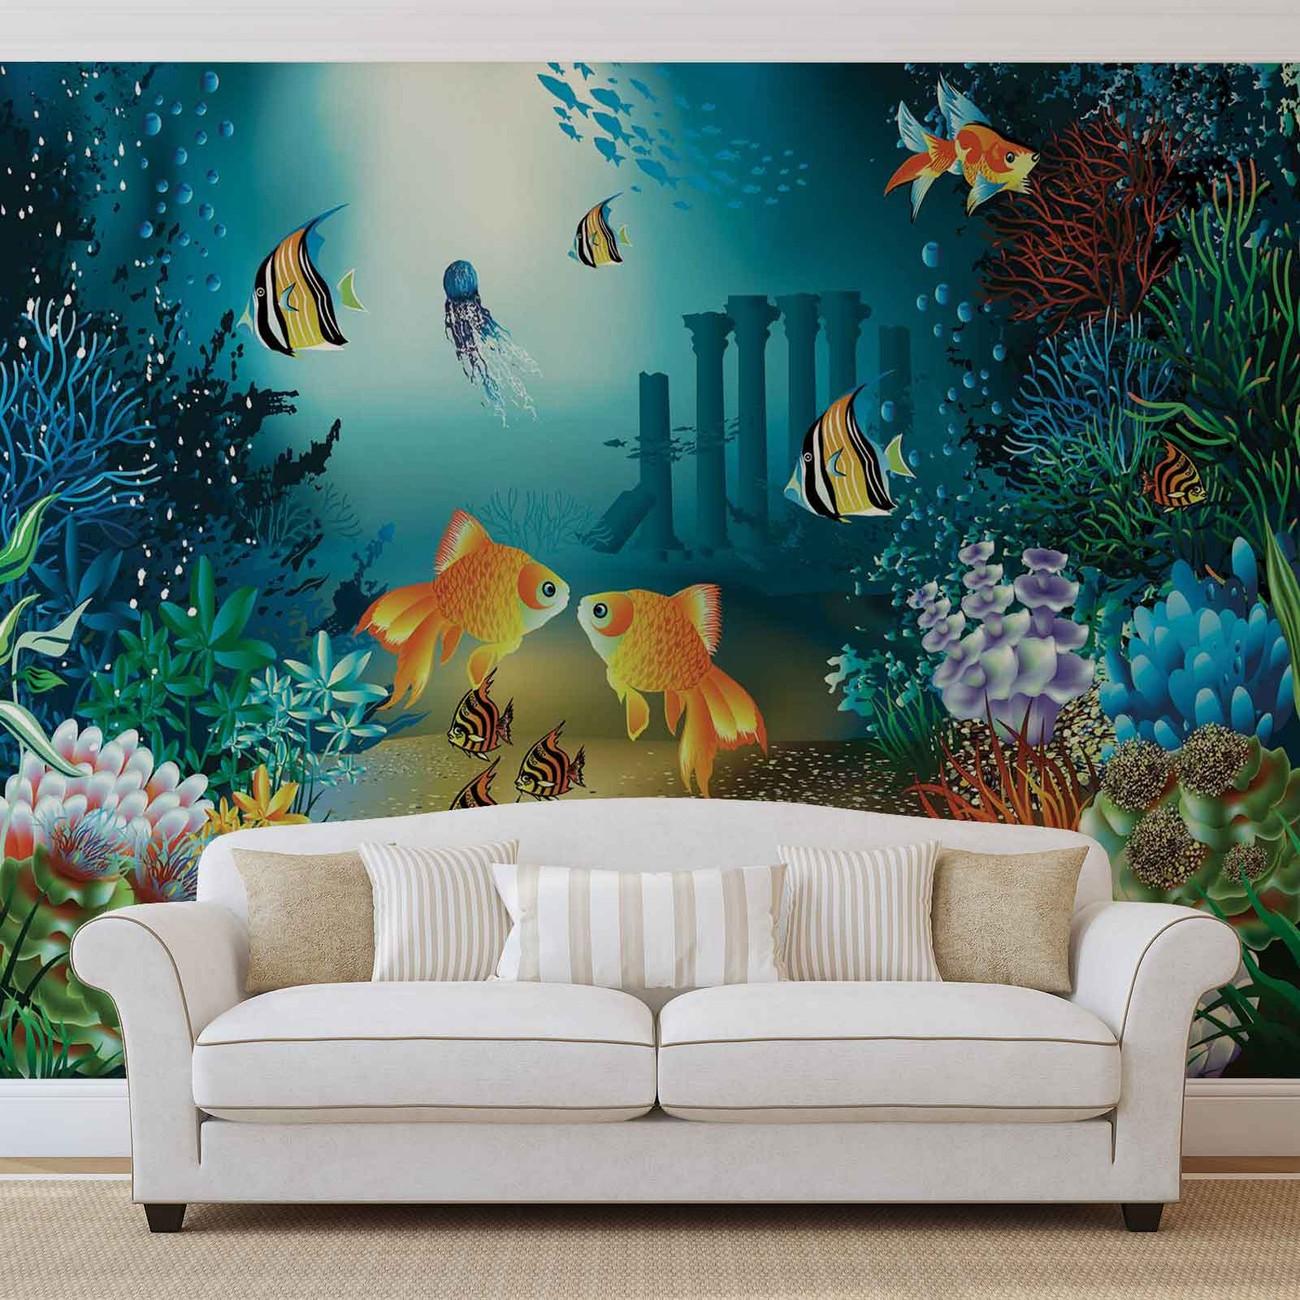 fototapete tapete fische korallen meer bei europosters kostenloser versand. Black Bedroom Furniture Sets. Home Design Ideas